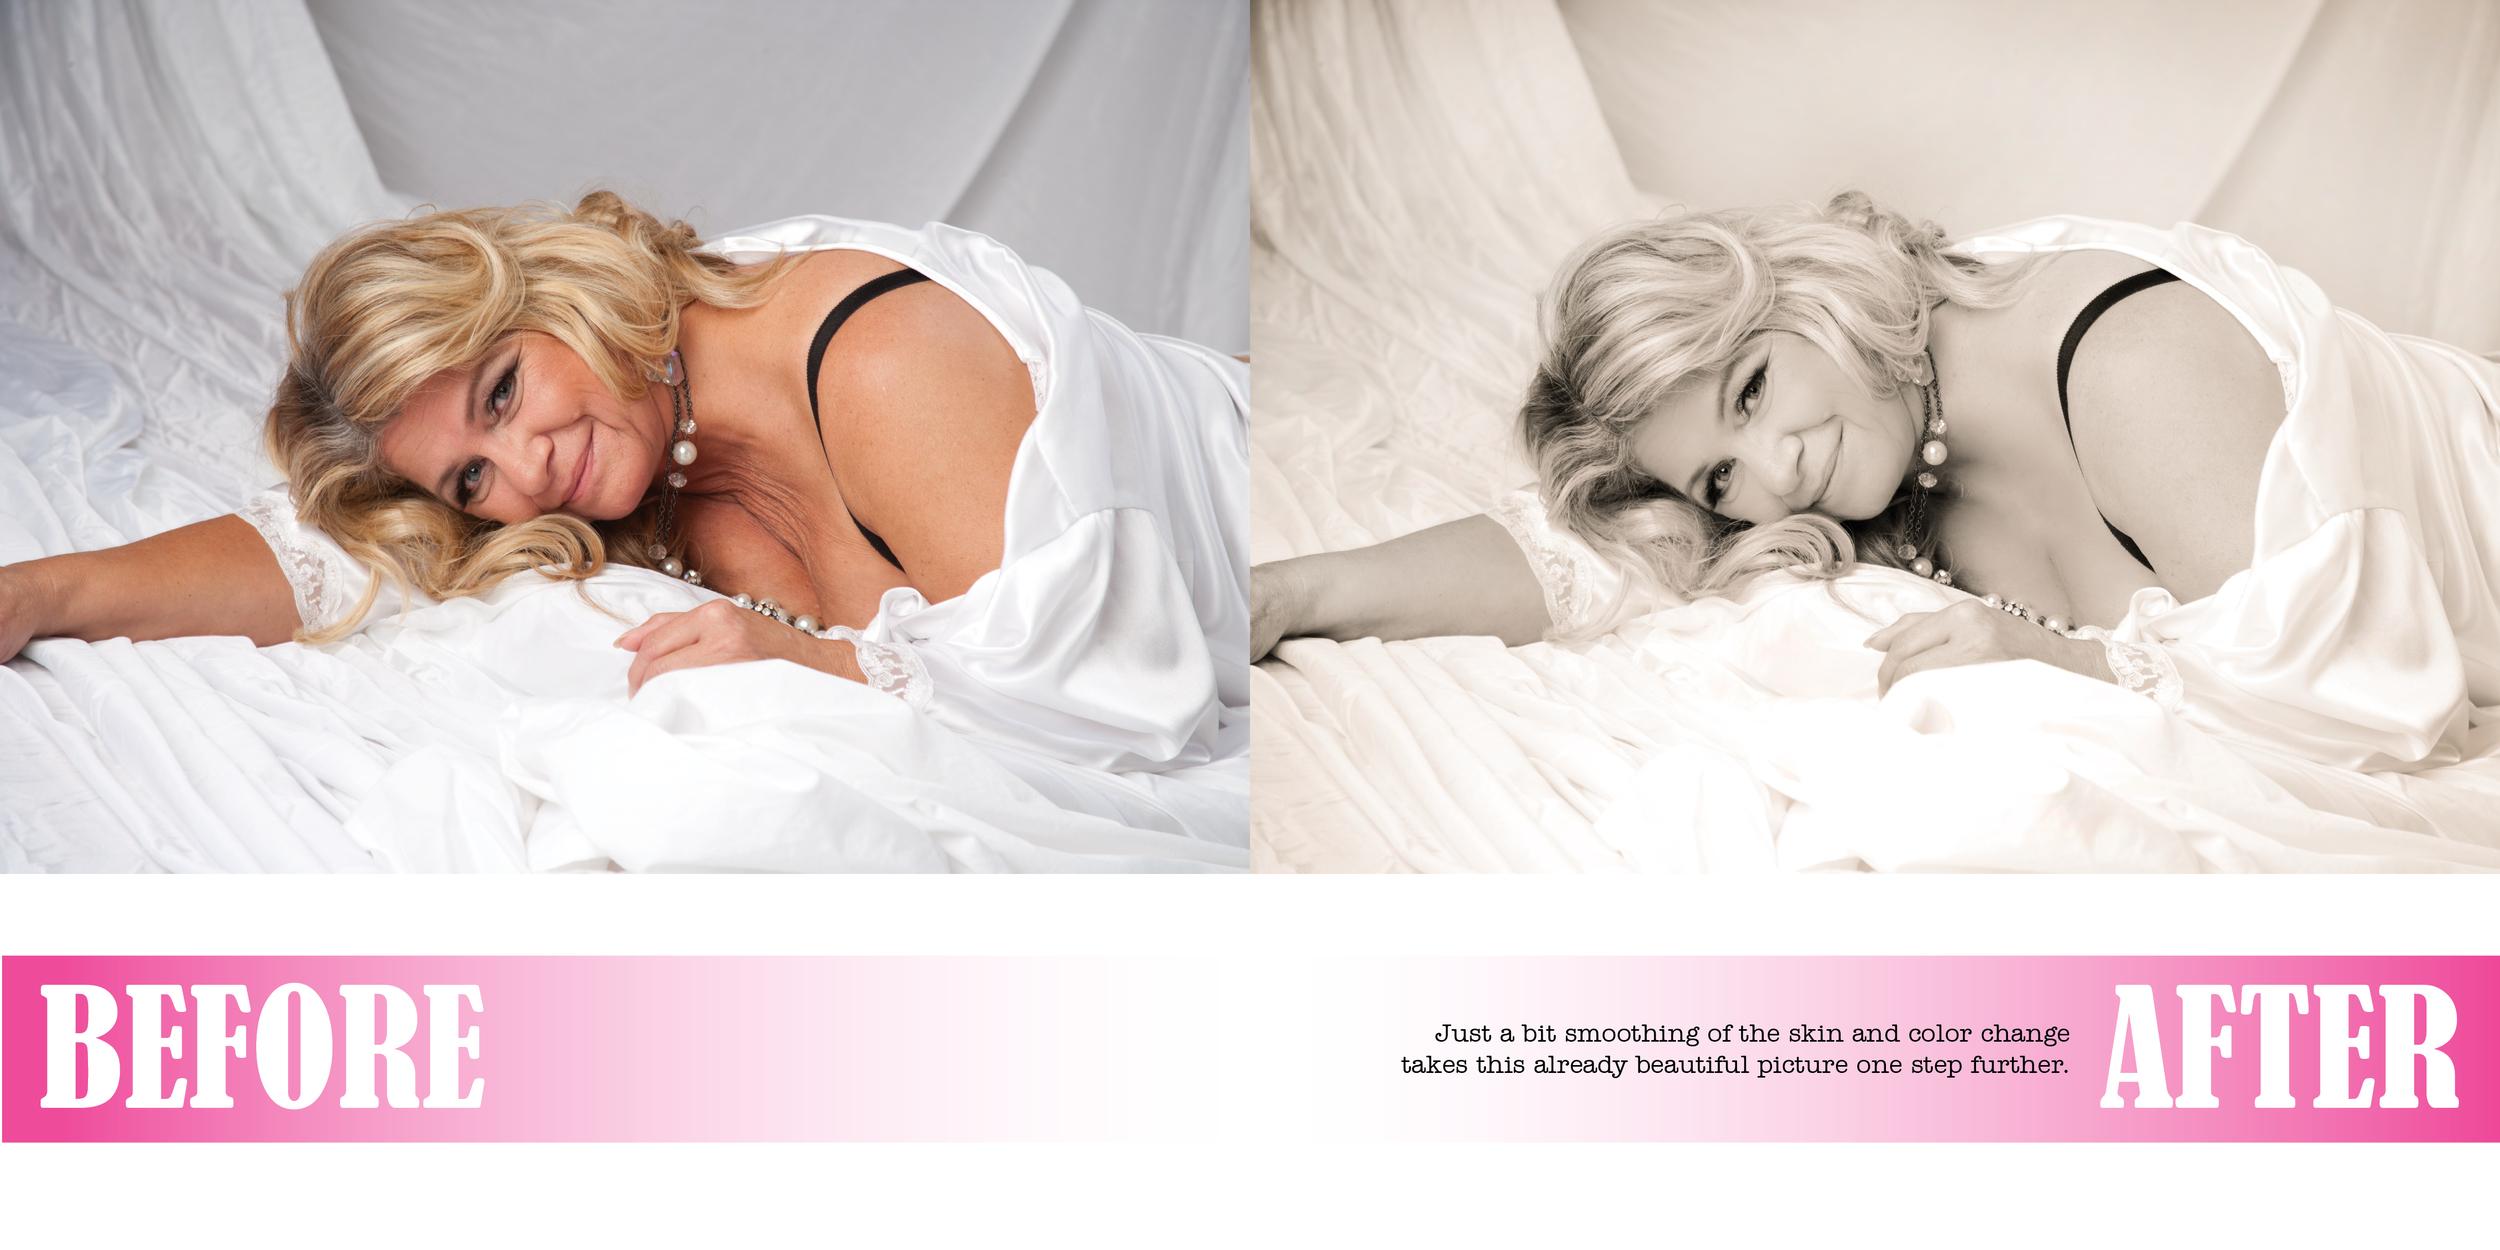 Sexy_Amore_new_jersey_photographer_boudoir_ (22)